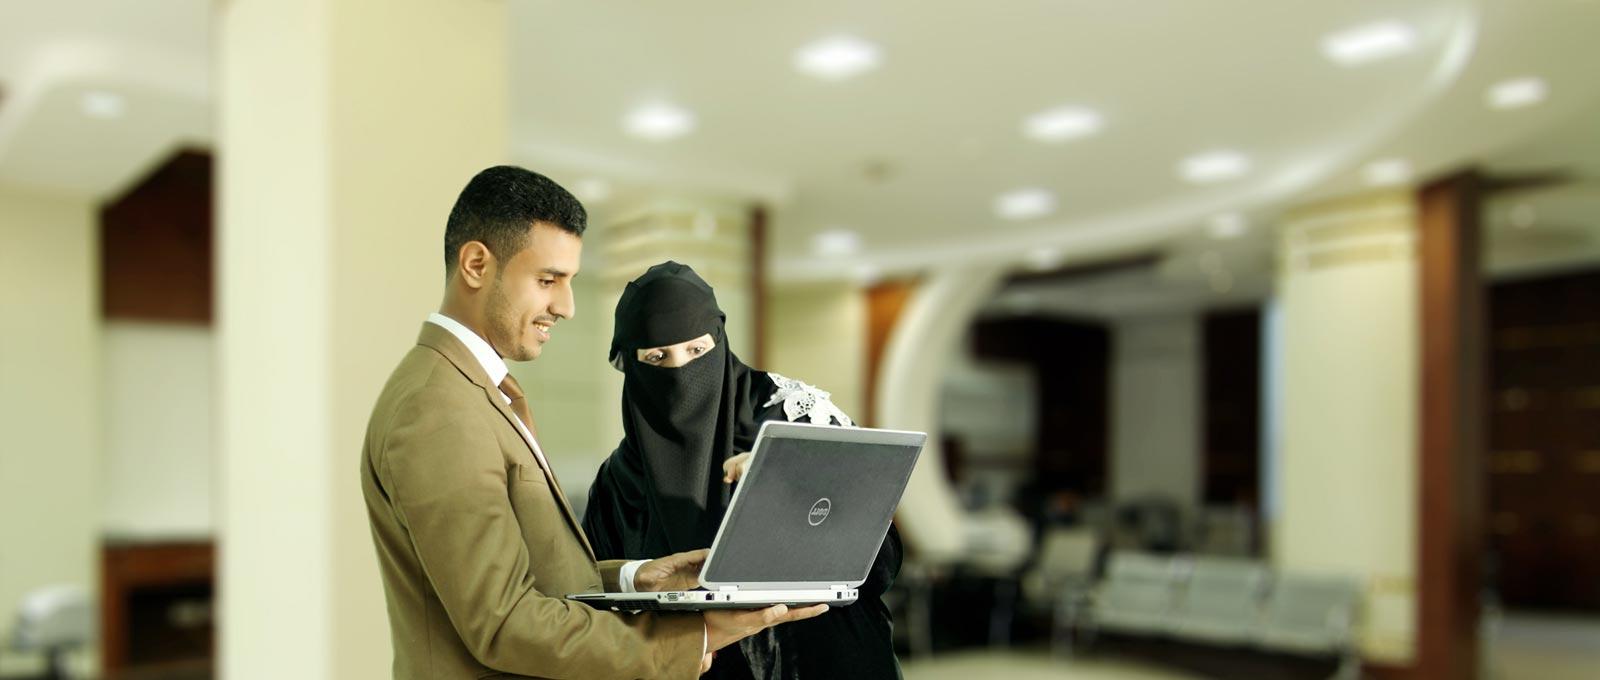 اسلامي اونلاين ISLAMIC ONLINE